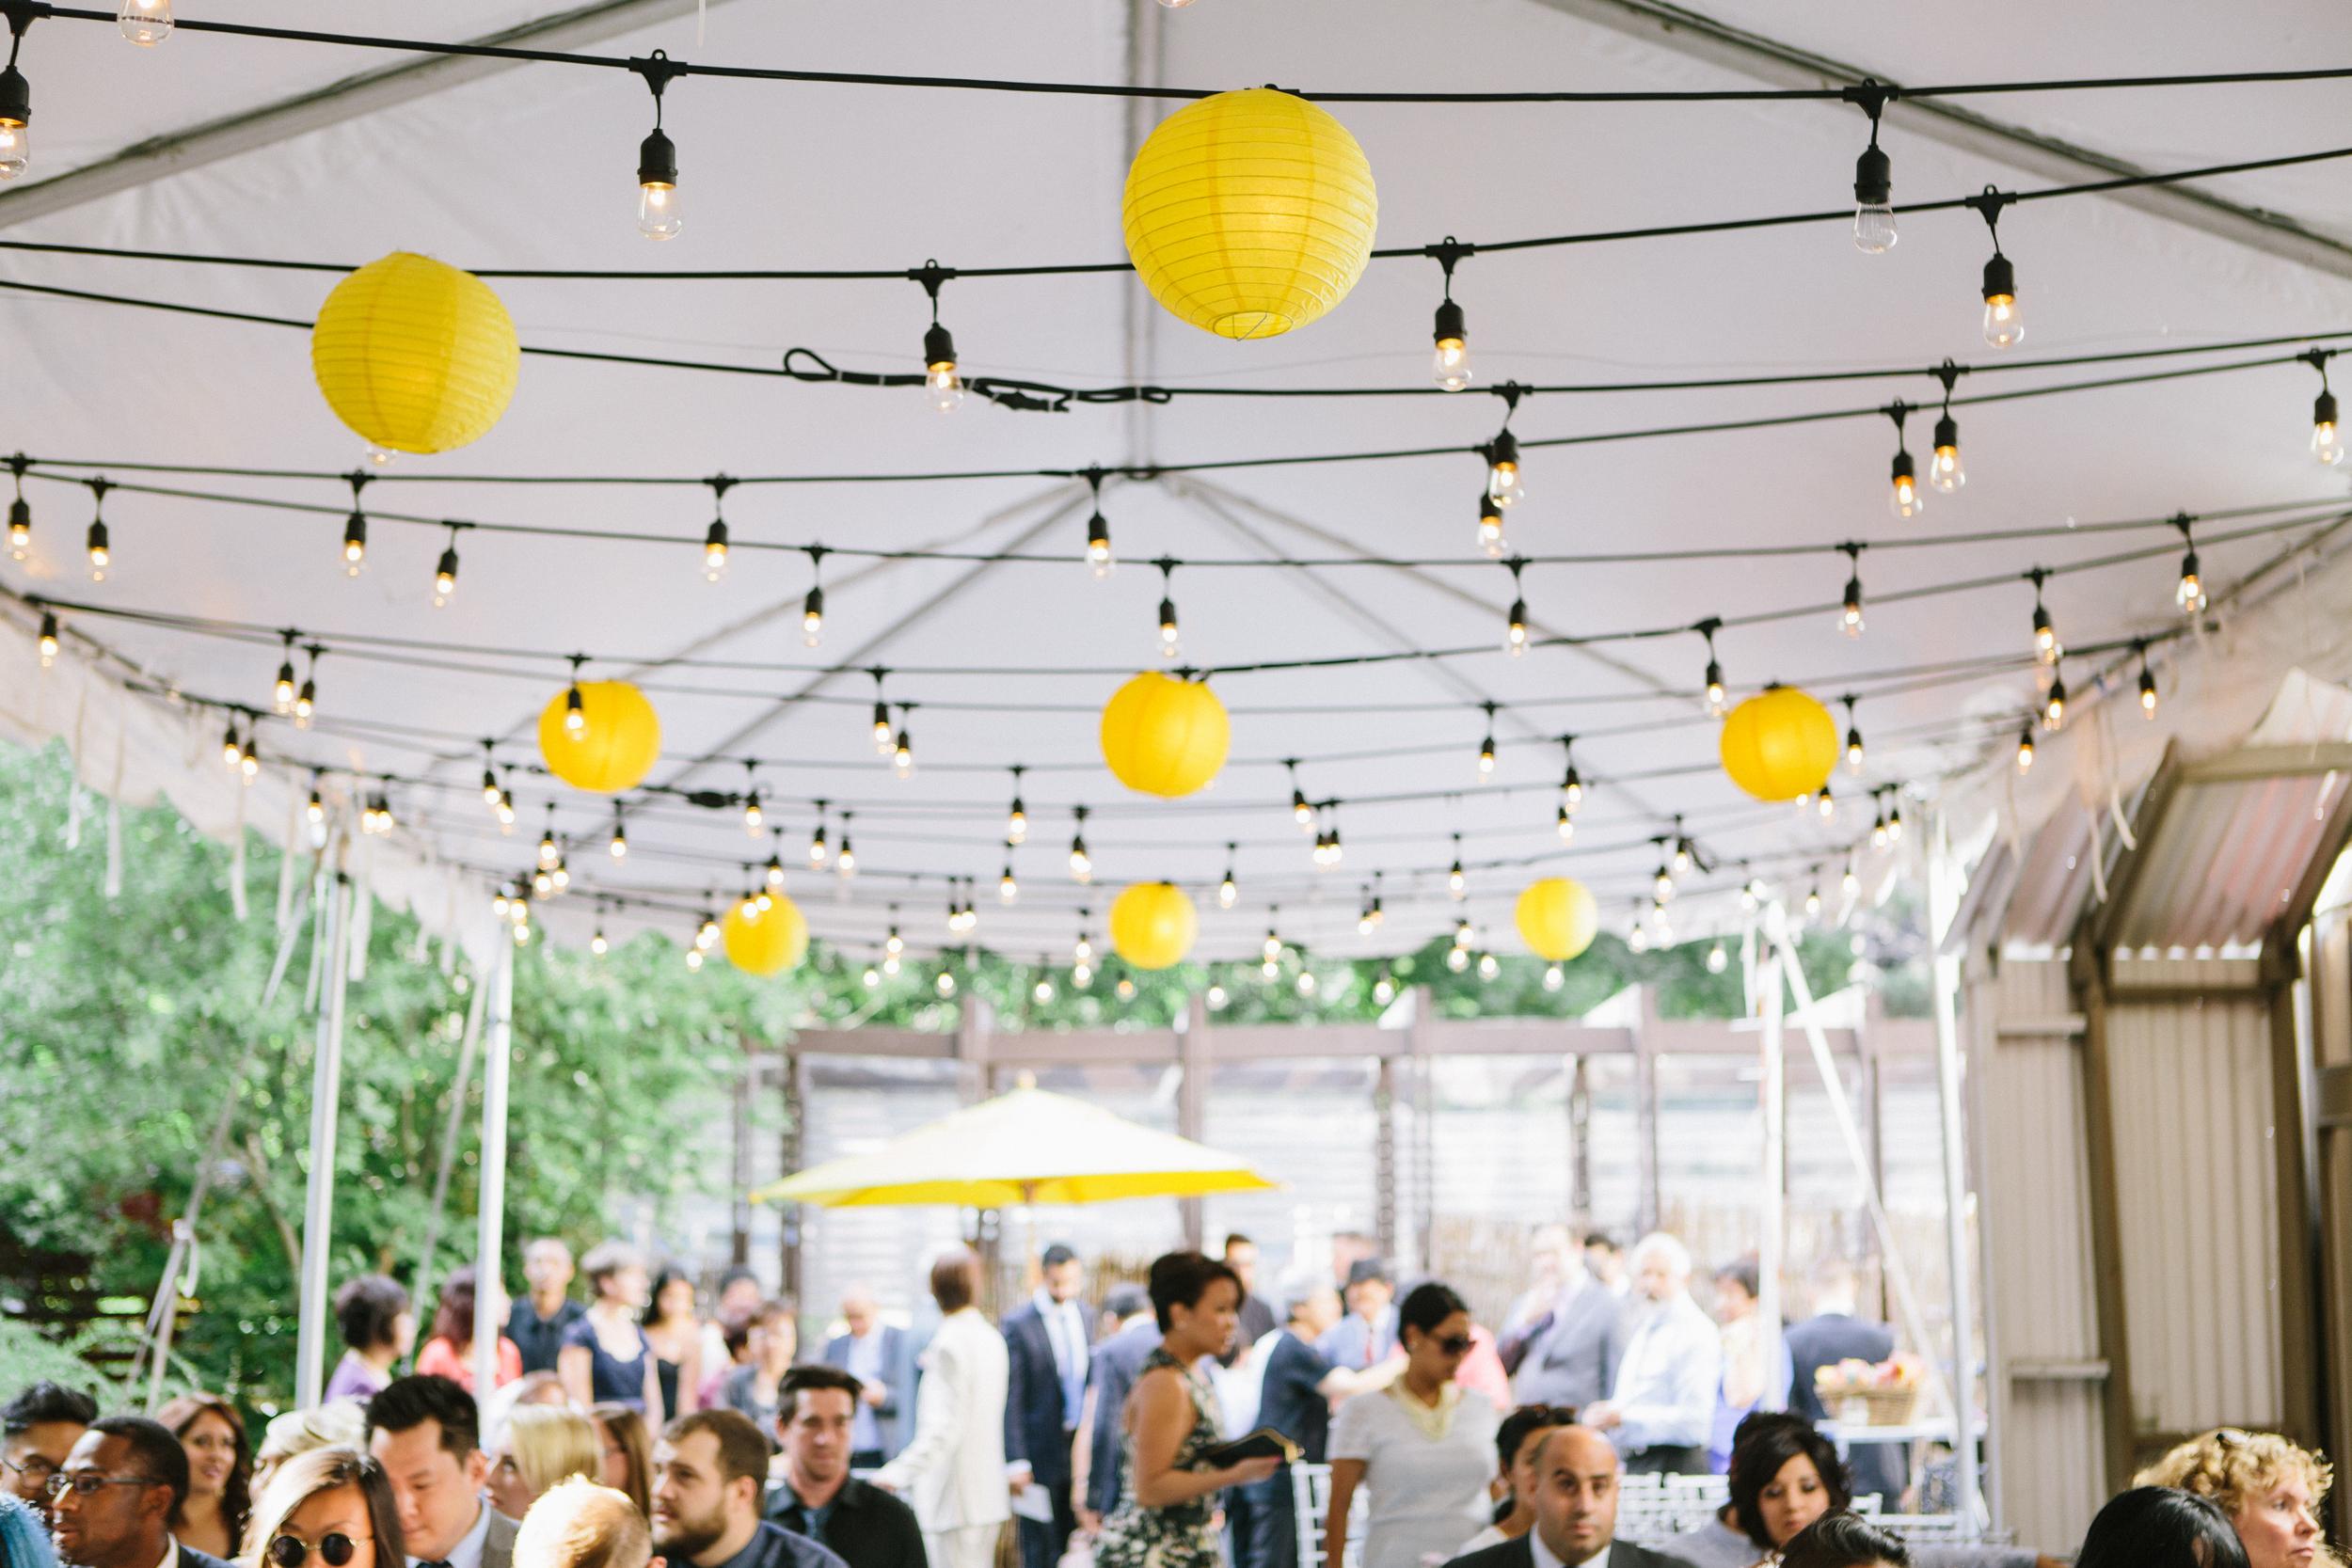 Berkeley-field-house-wedding-nicola-ken-053.jpg